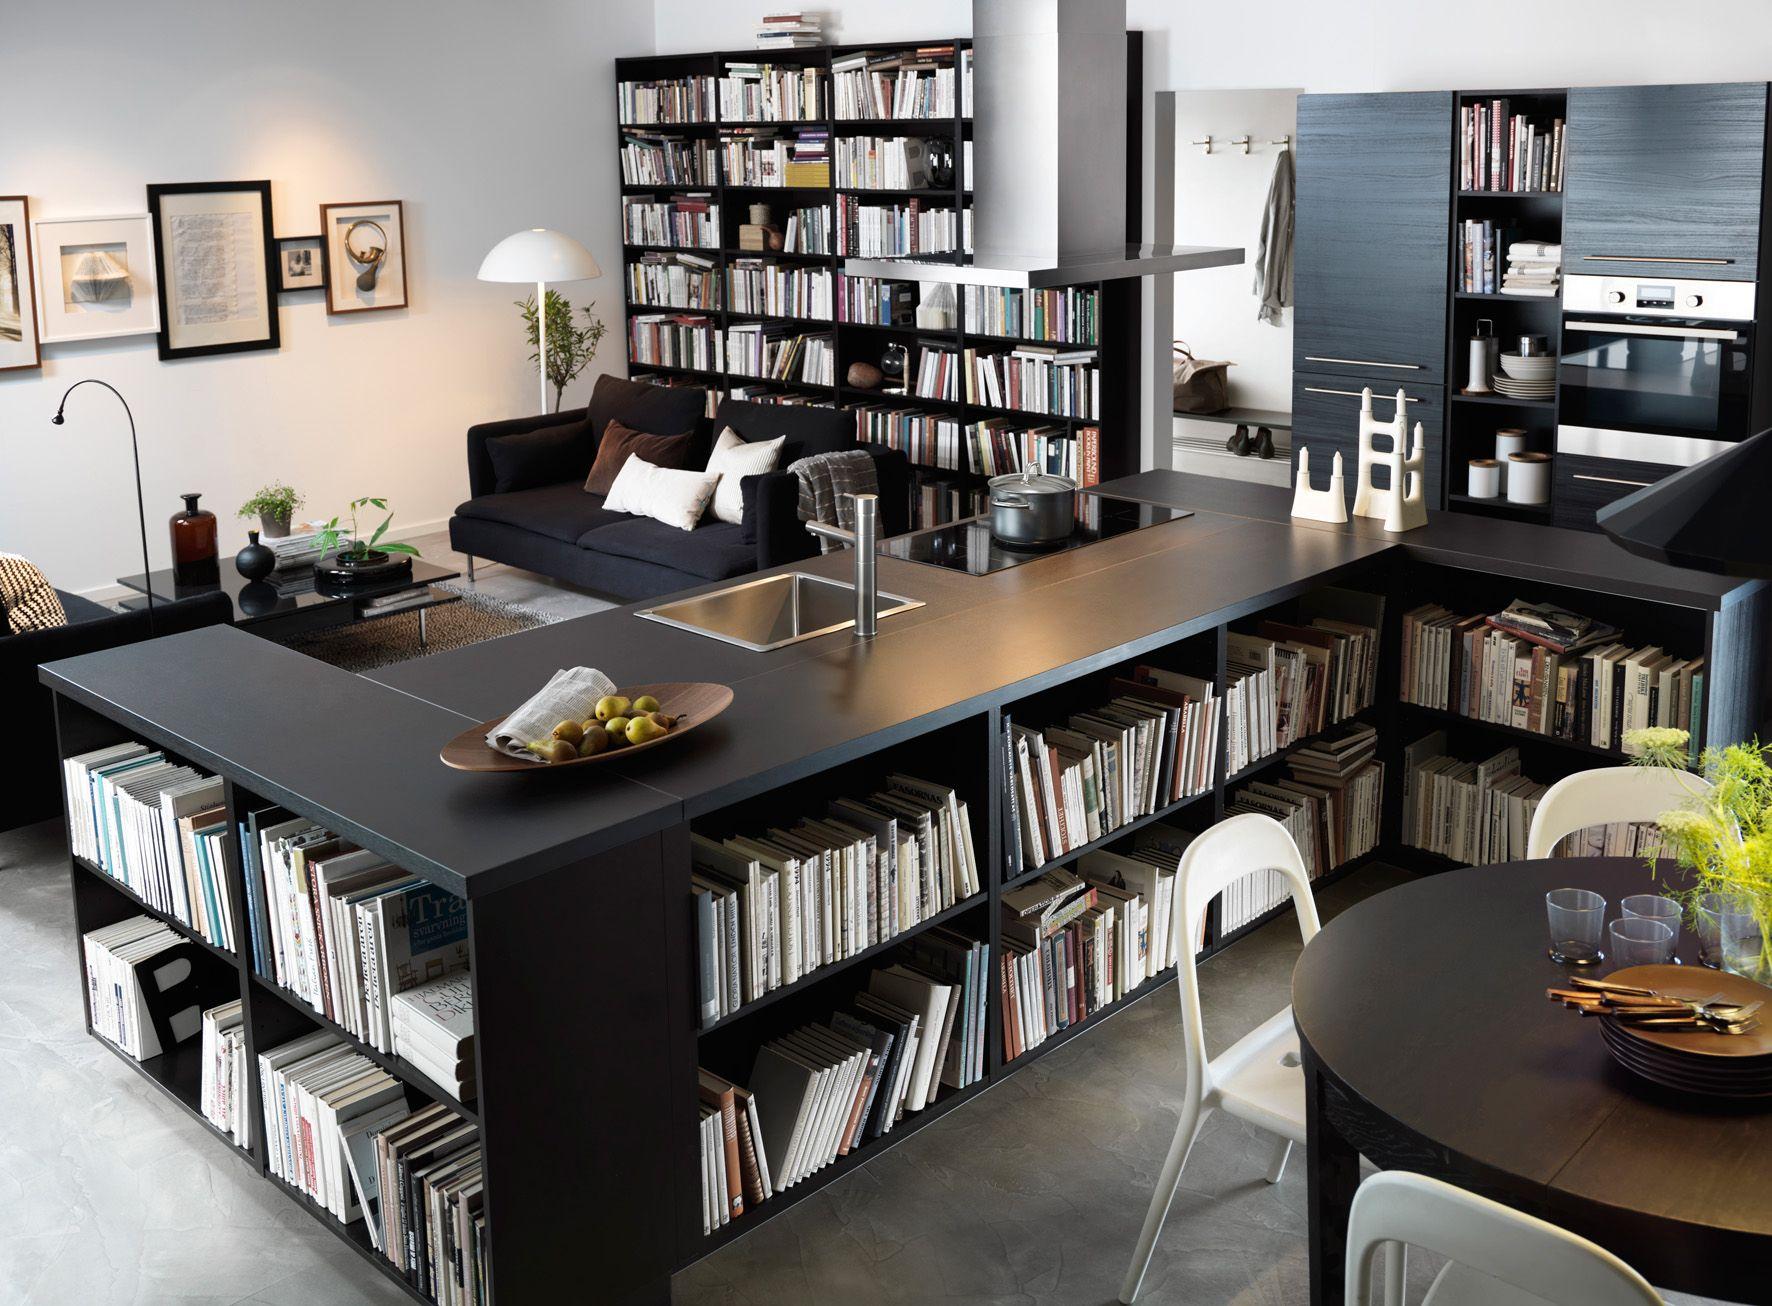 MeToD+IKEA+2014+kitchen+wien+vienna+präsentation+event+disi+couture+033.jpg 1772×1306 pikseli